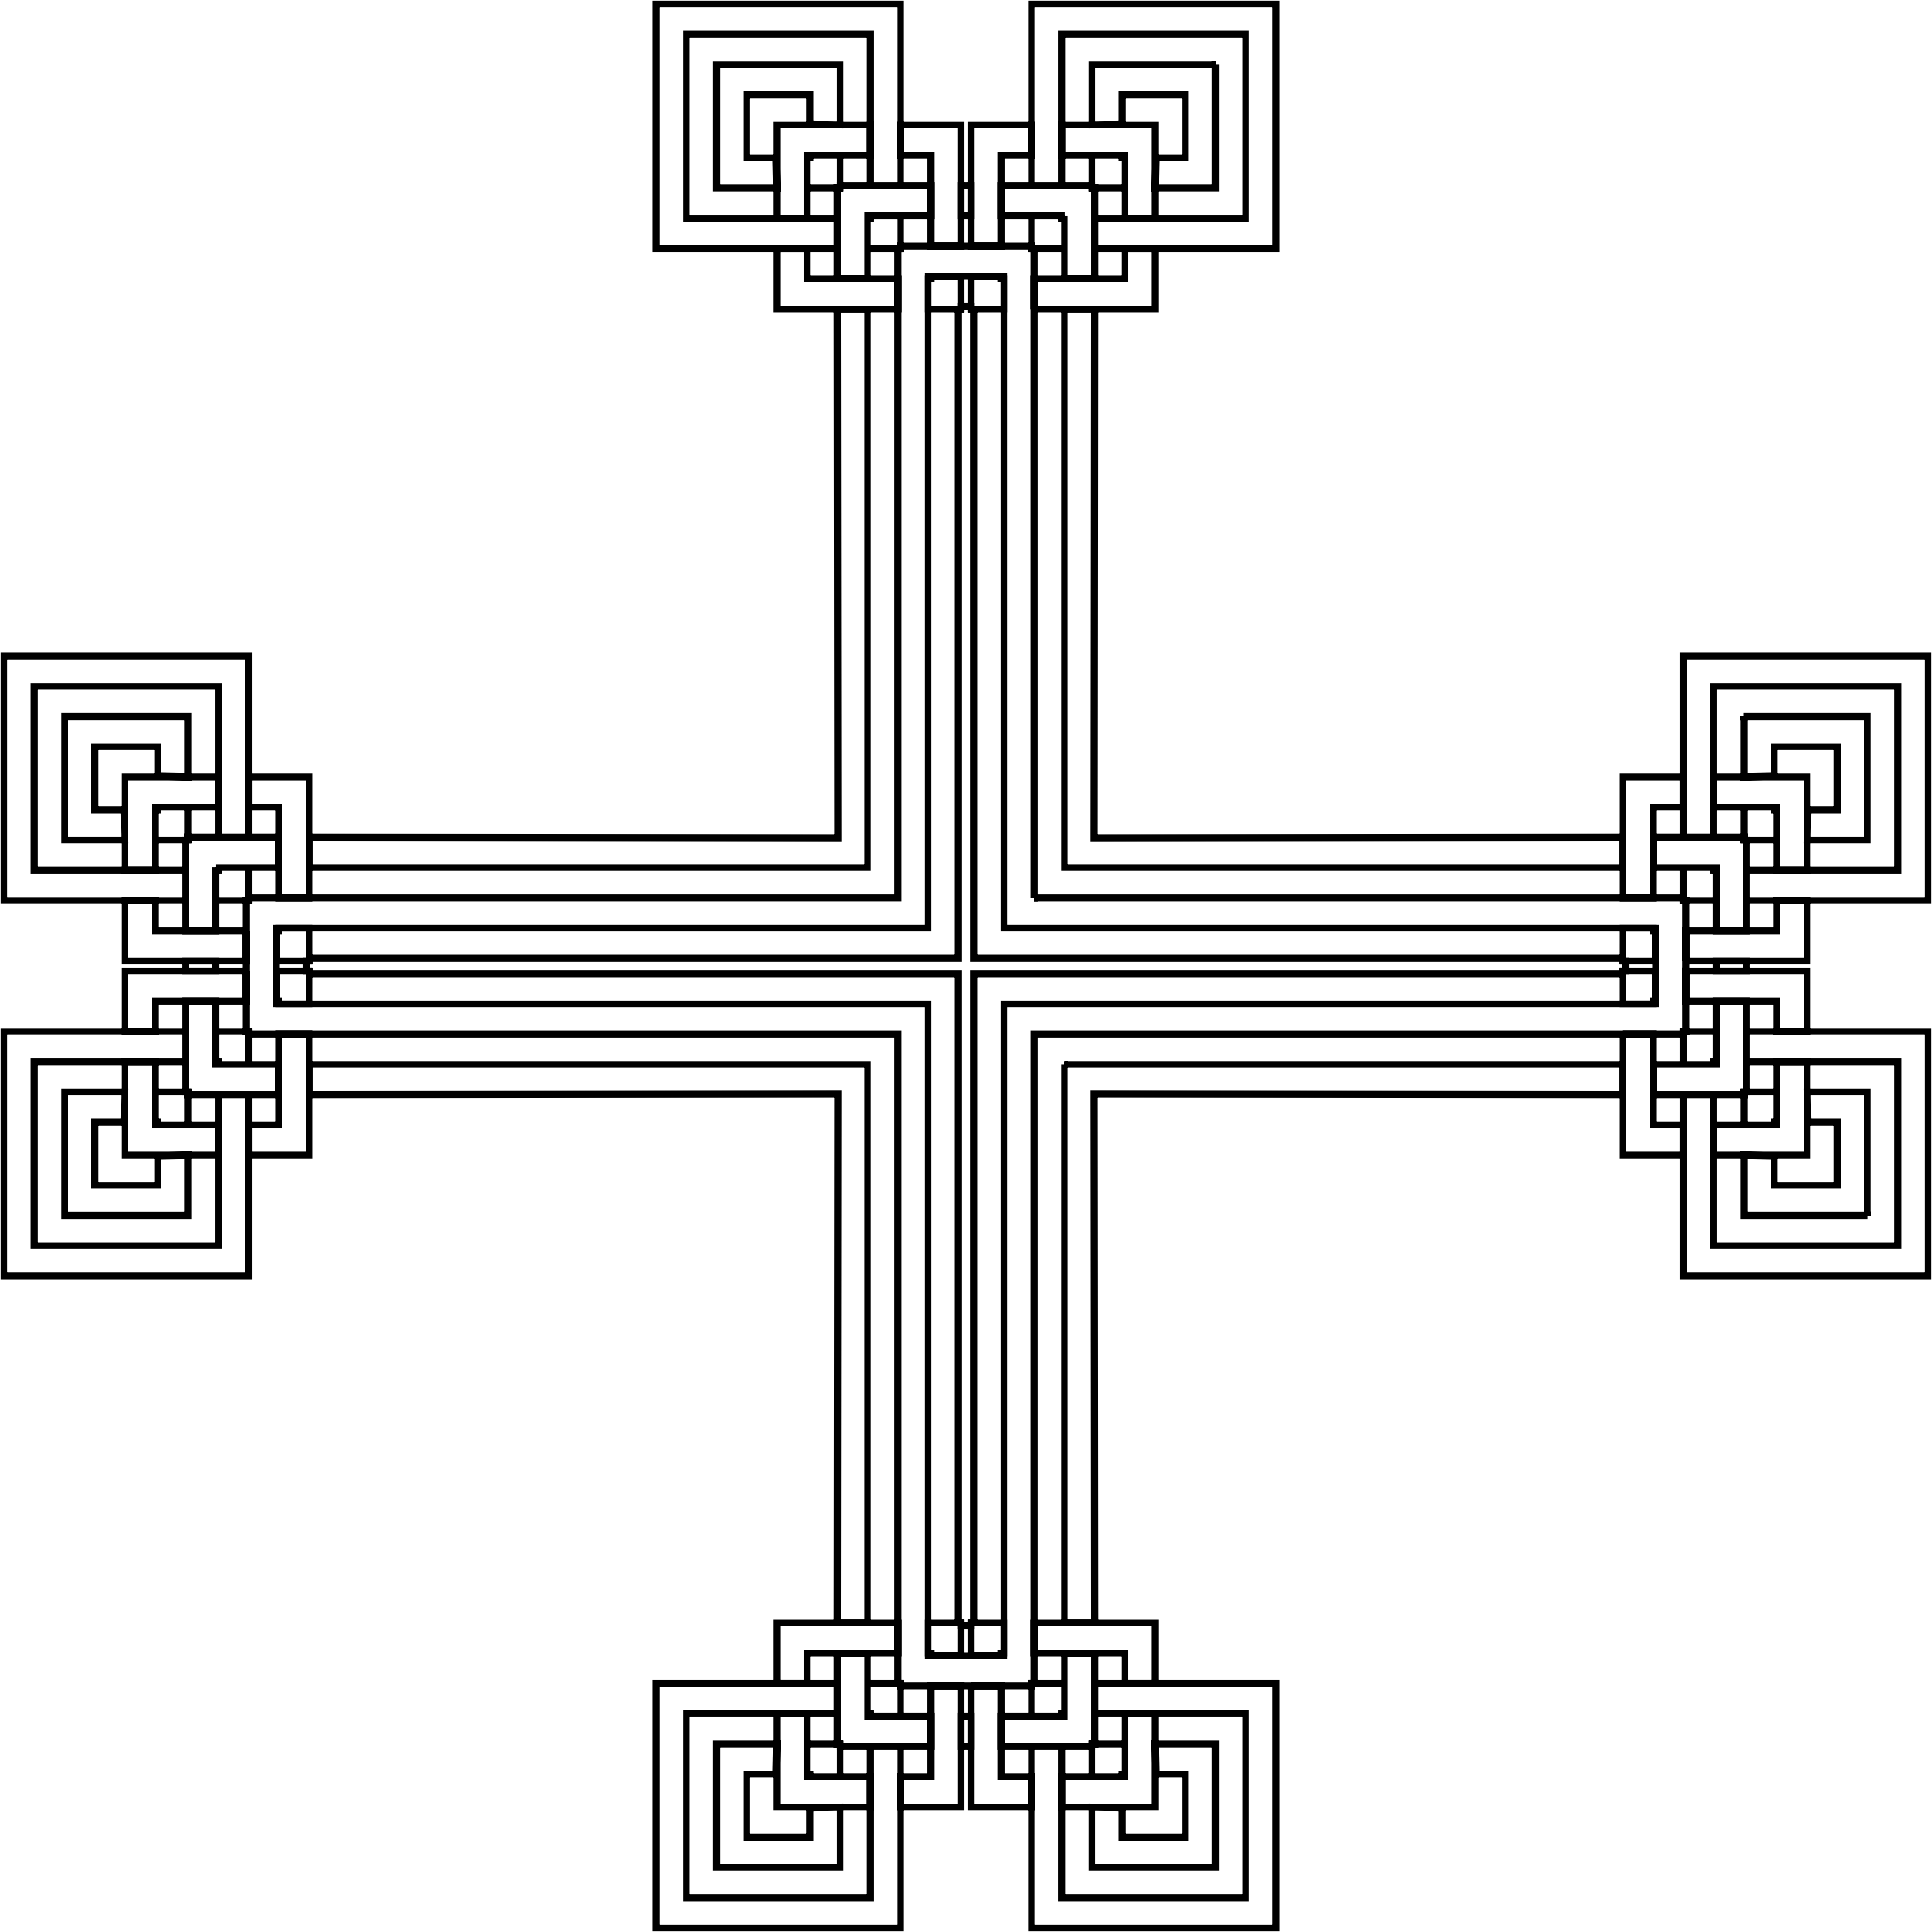 Clipart ornamental big image. Cross clip art fancy